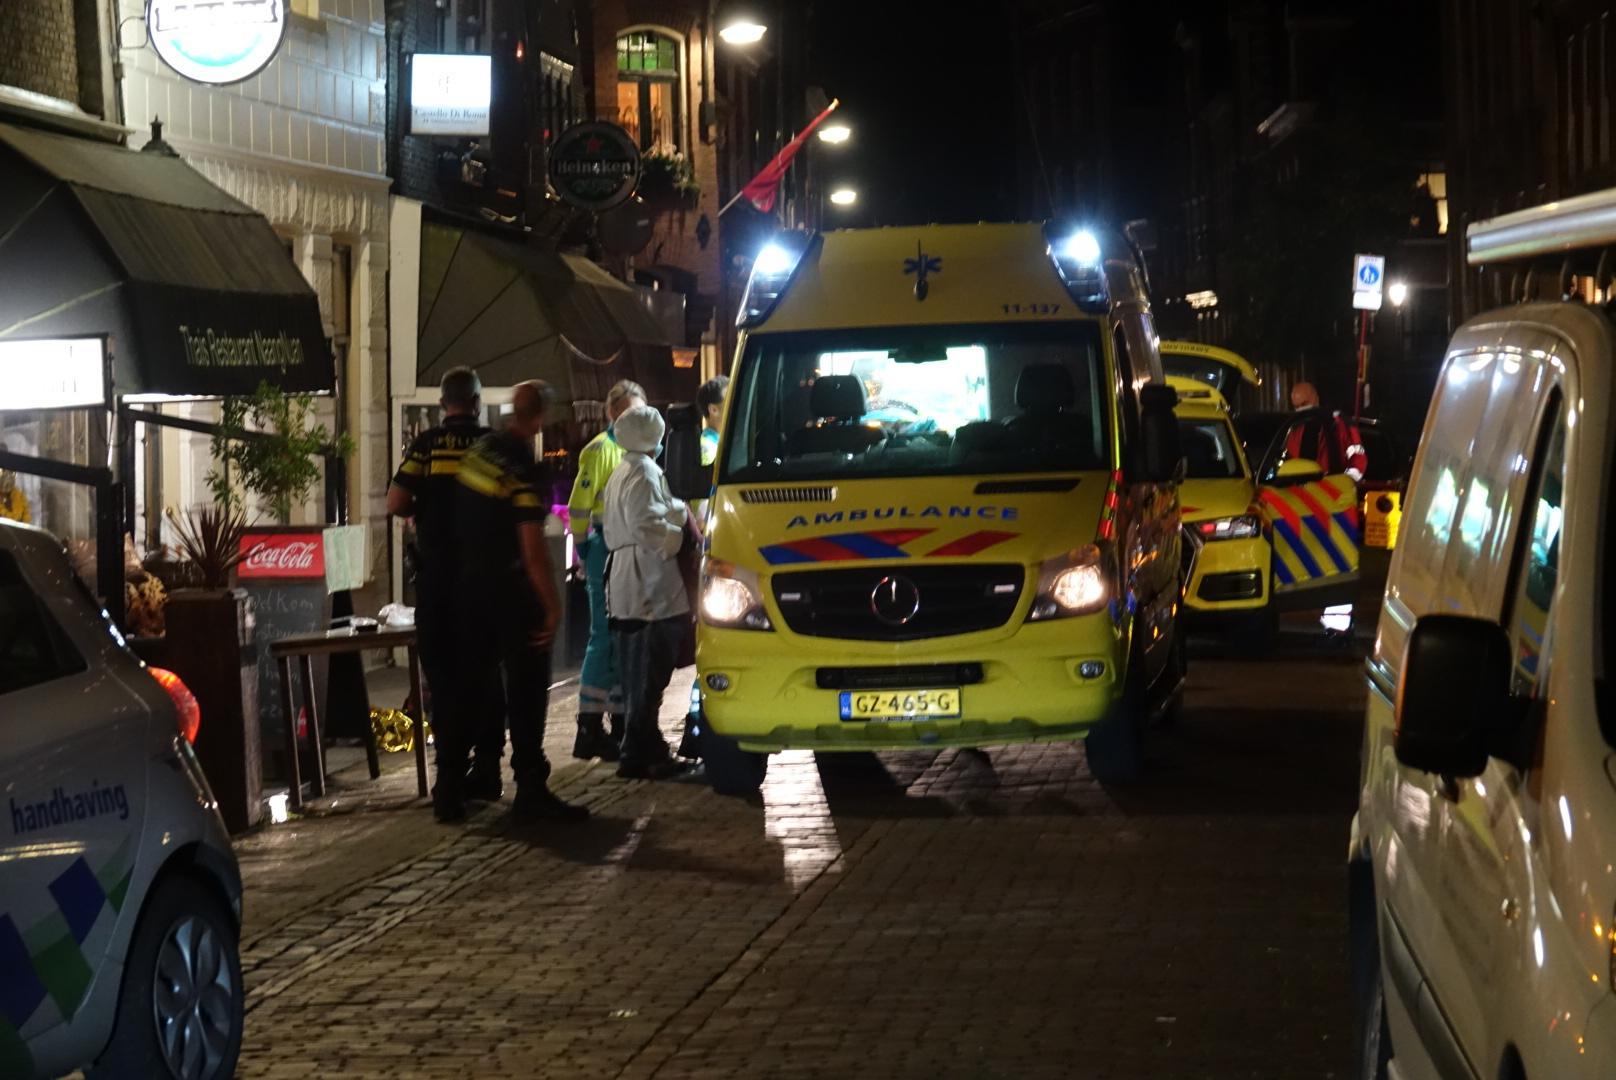 Twee personen in restaurant in Monnickendam gewond bij steekpartij